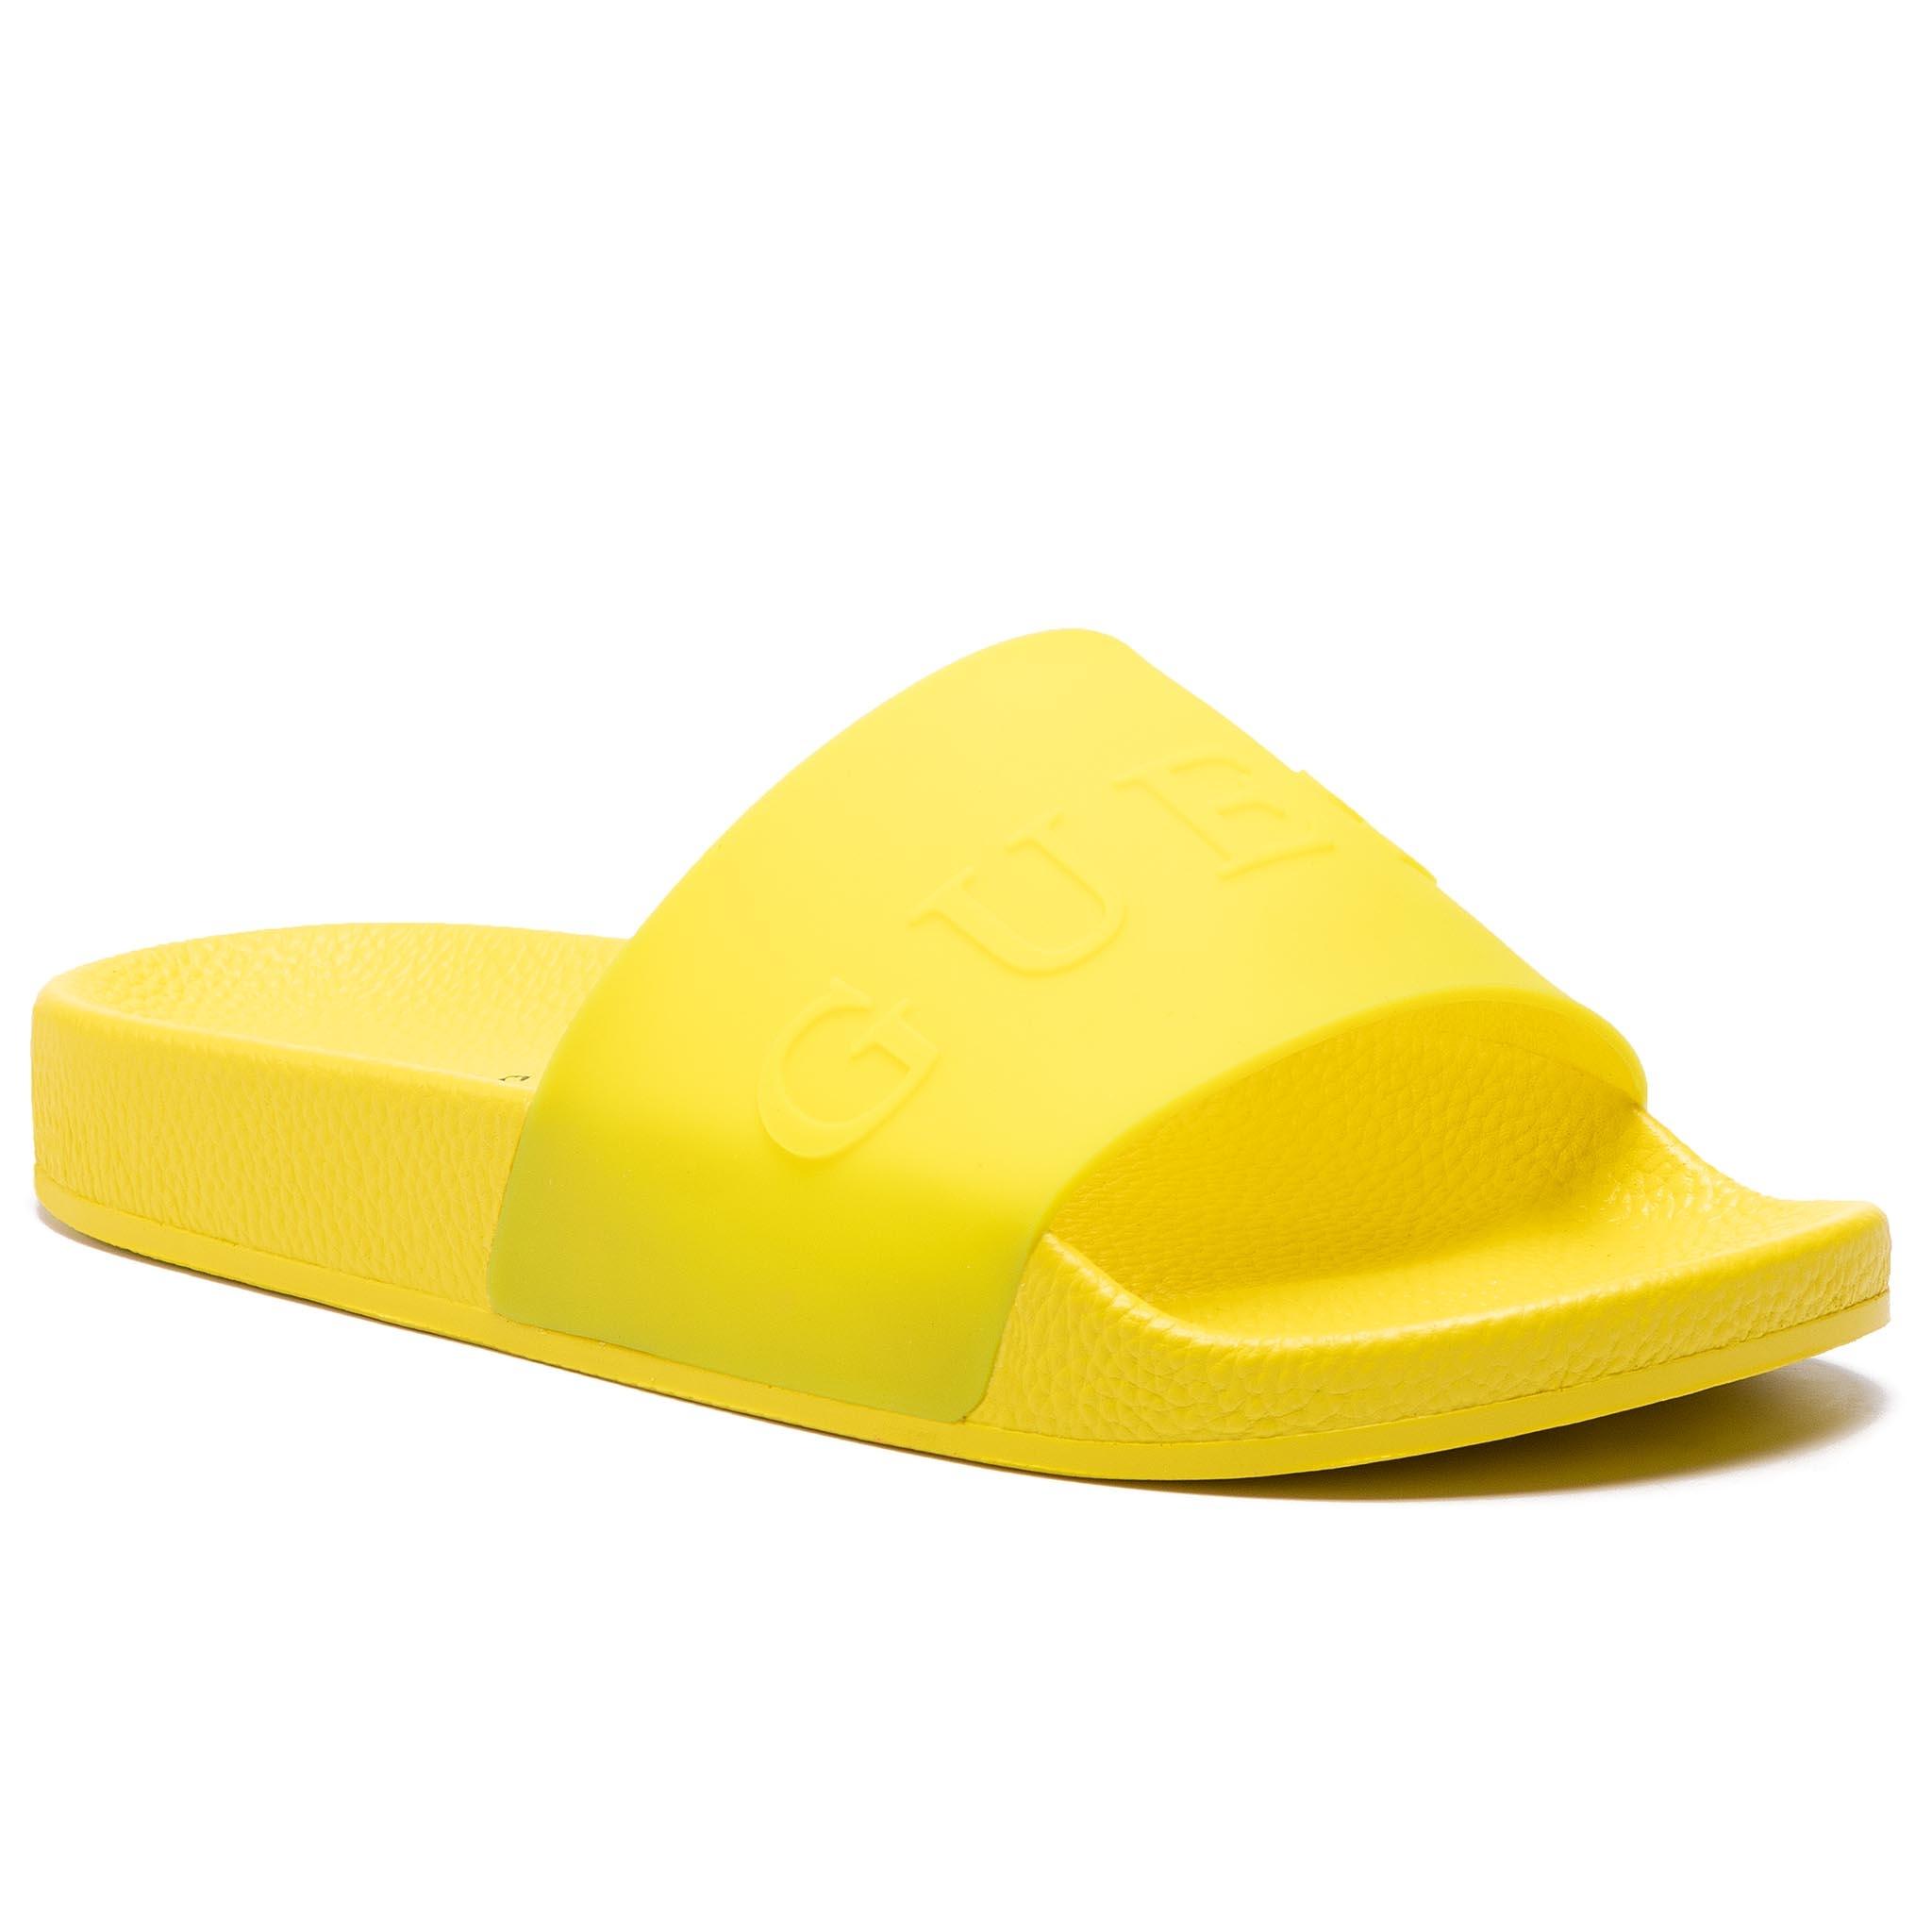 Papucs GEOX - D Tamas B D02DLB 00254 C9999  Black - Hétköznapi papucsok - Papucsok - Papucsok és szandálok - Női